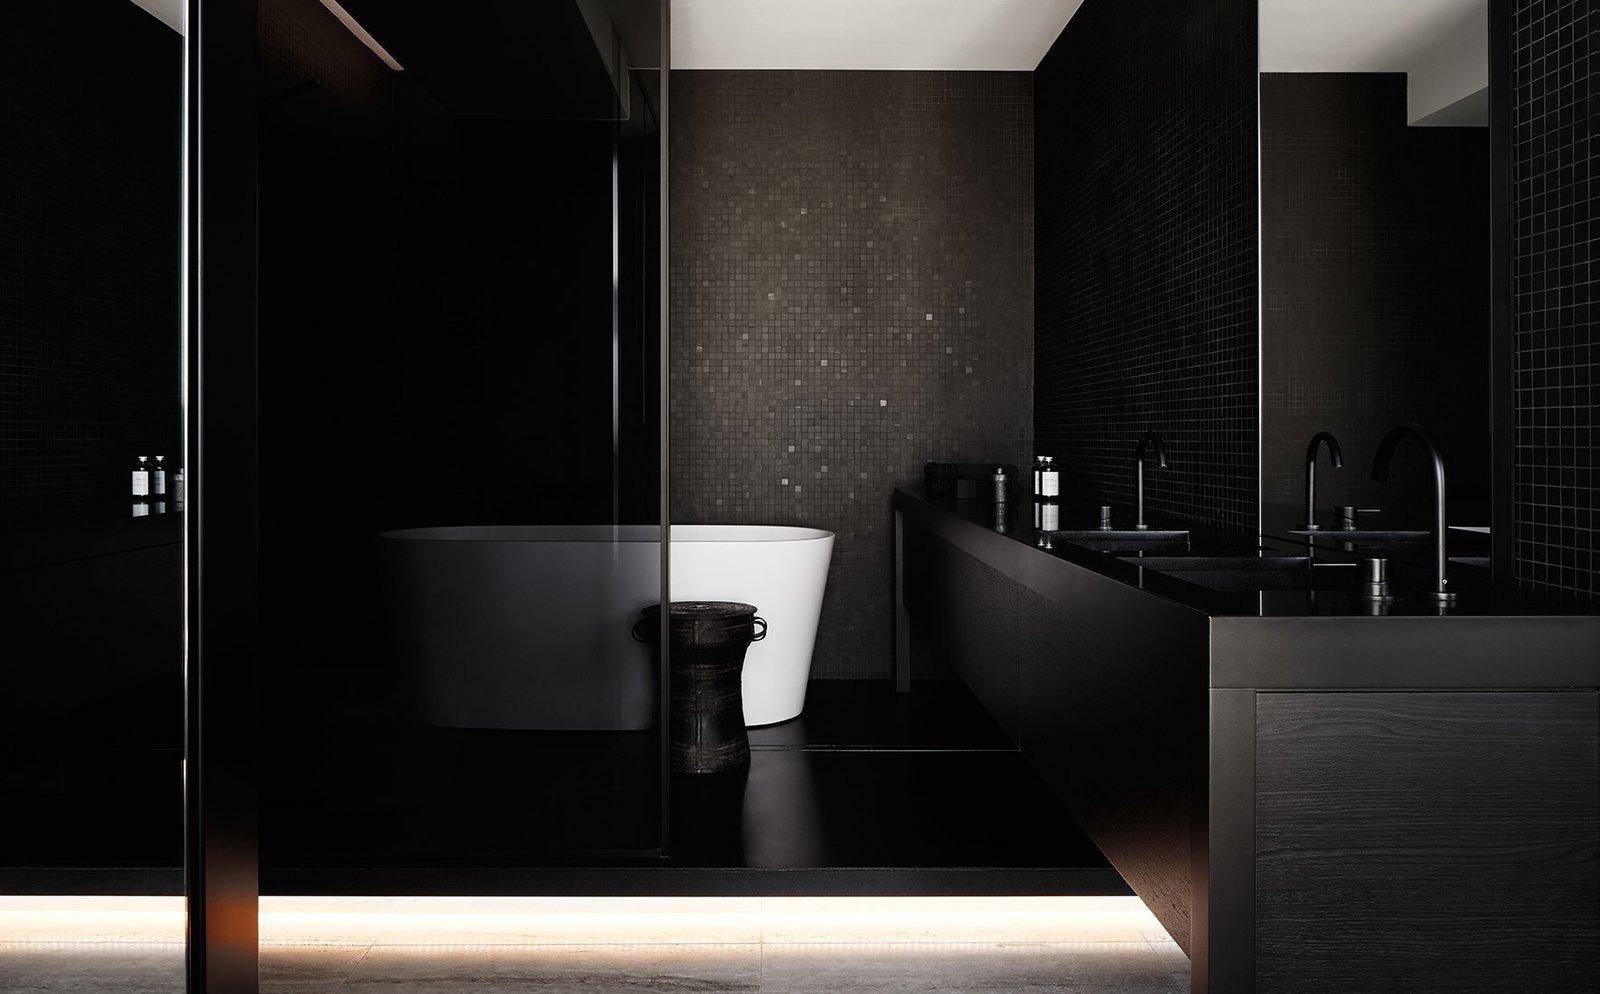 Bed, Medium Hardwood Floor, Laminate Counter, Wood Cabinet, Sofa, Bath Room, and Track Lighting  Darling Point